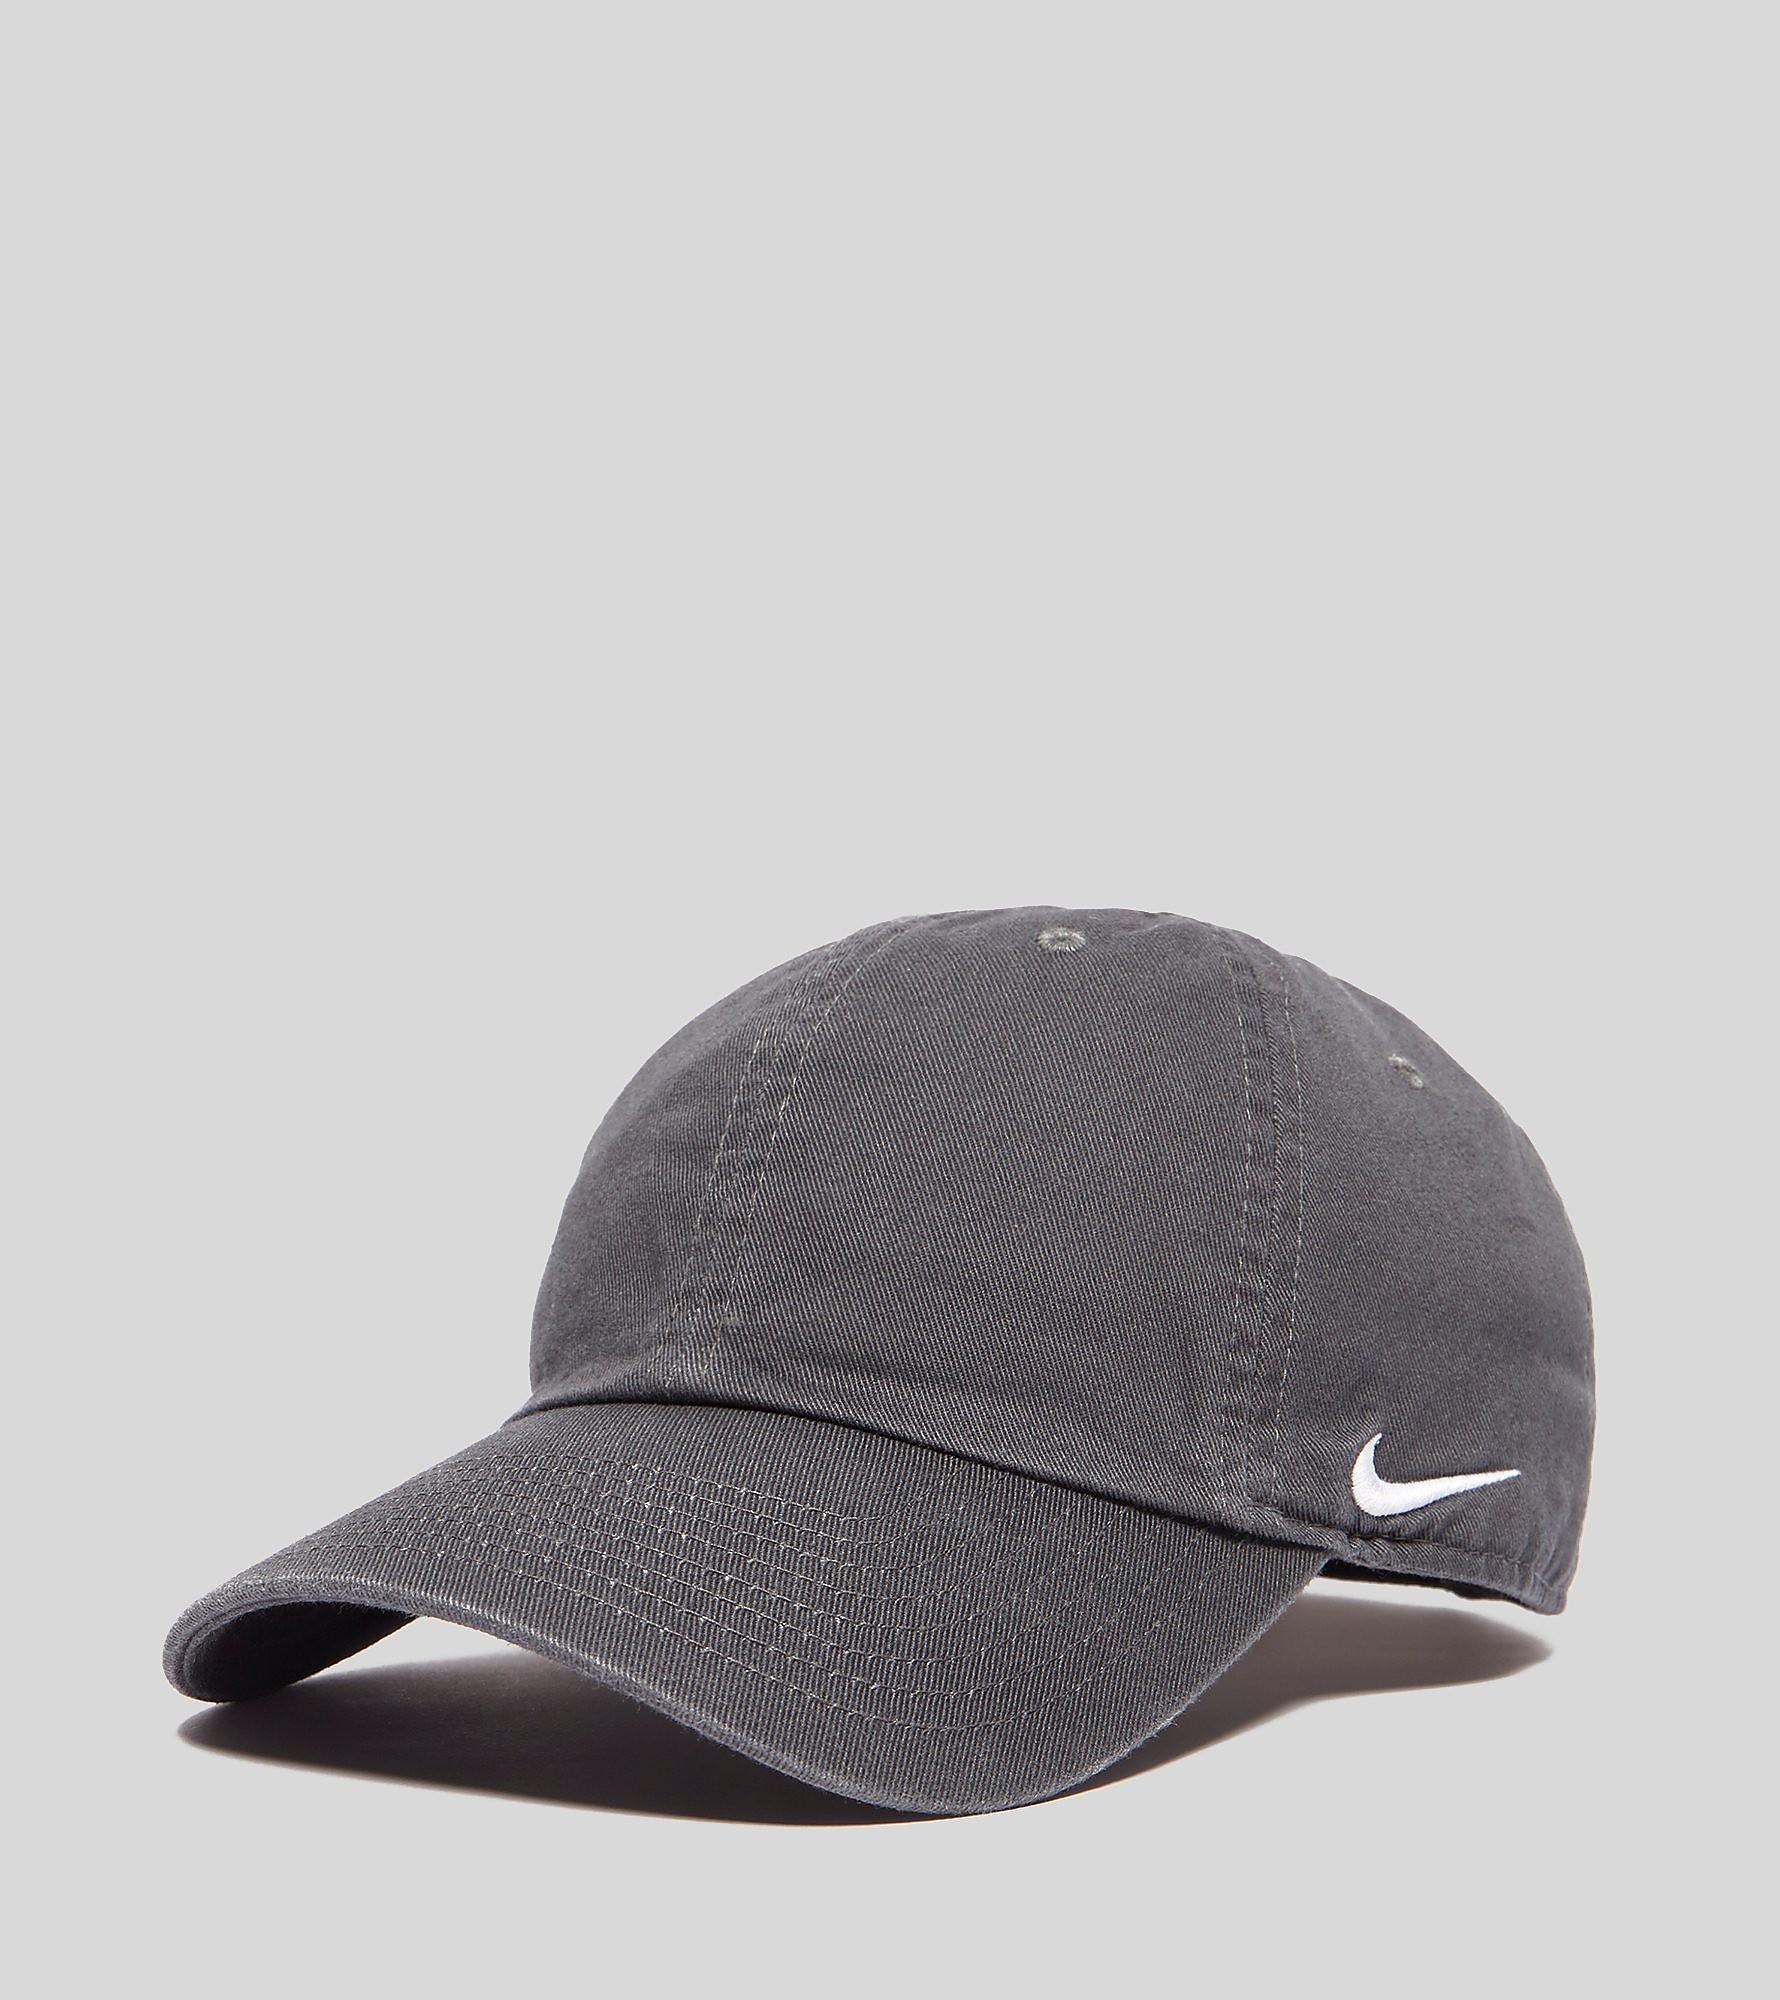 Nike Casquette Side Swoosh